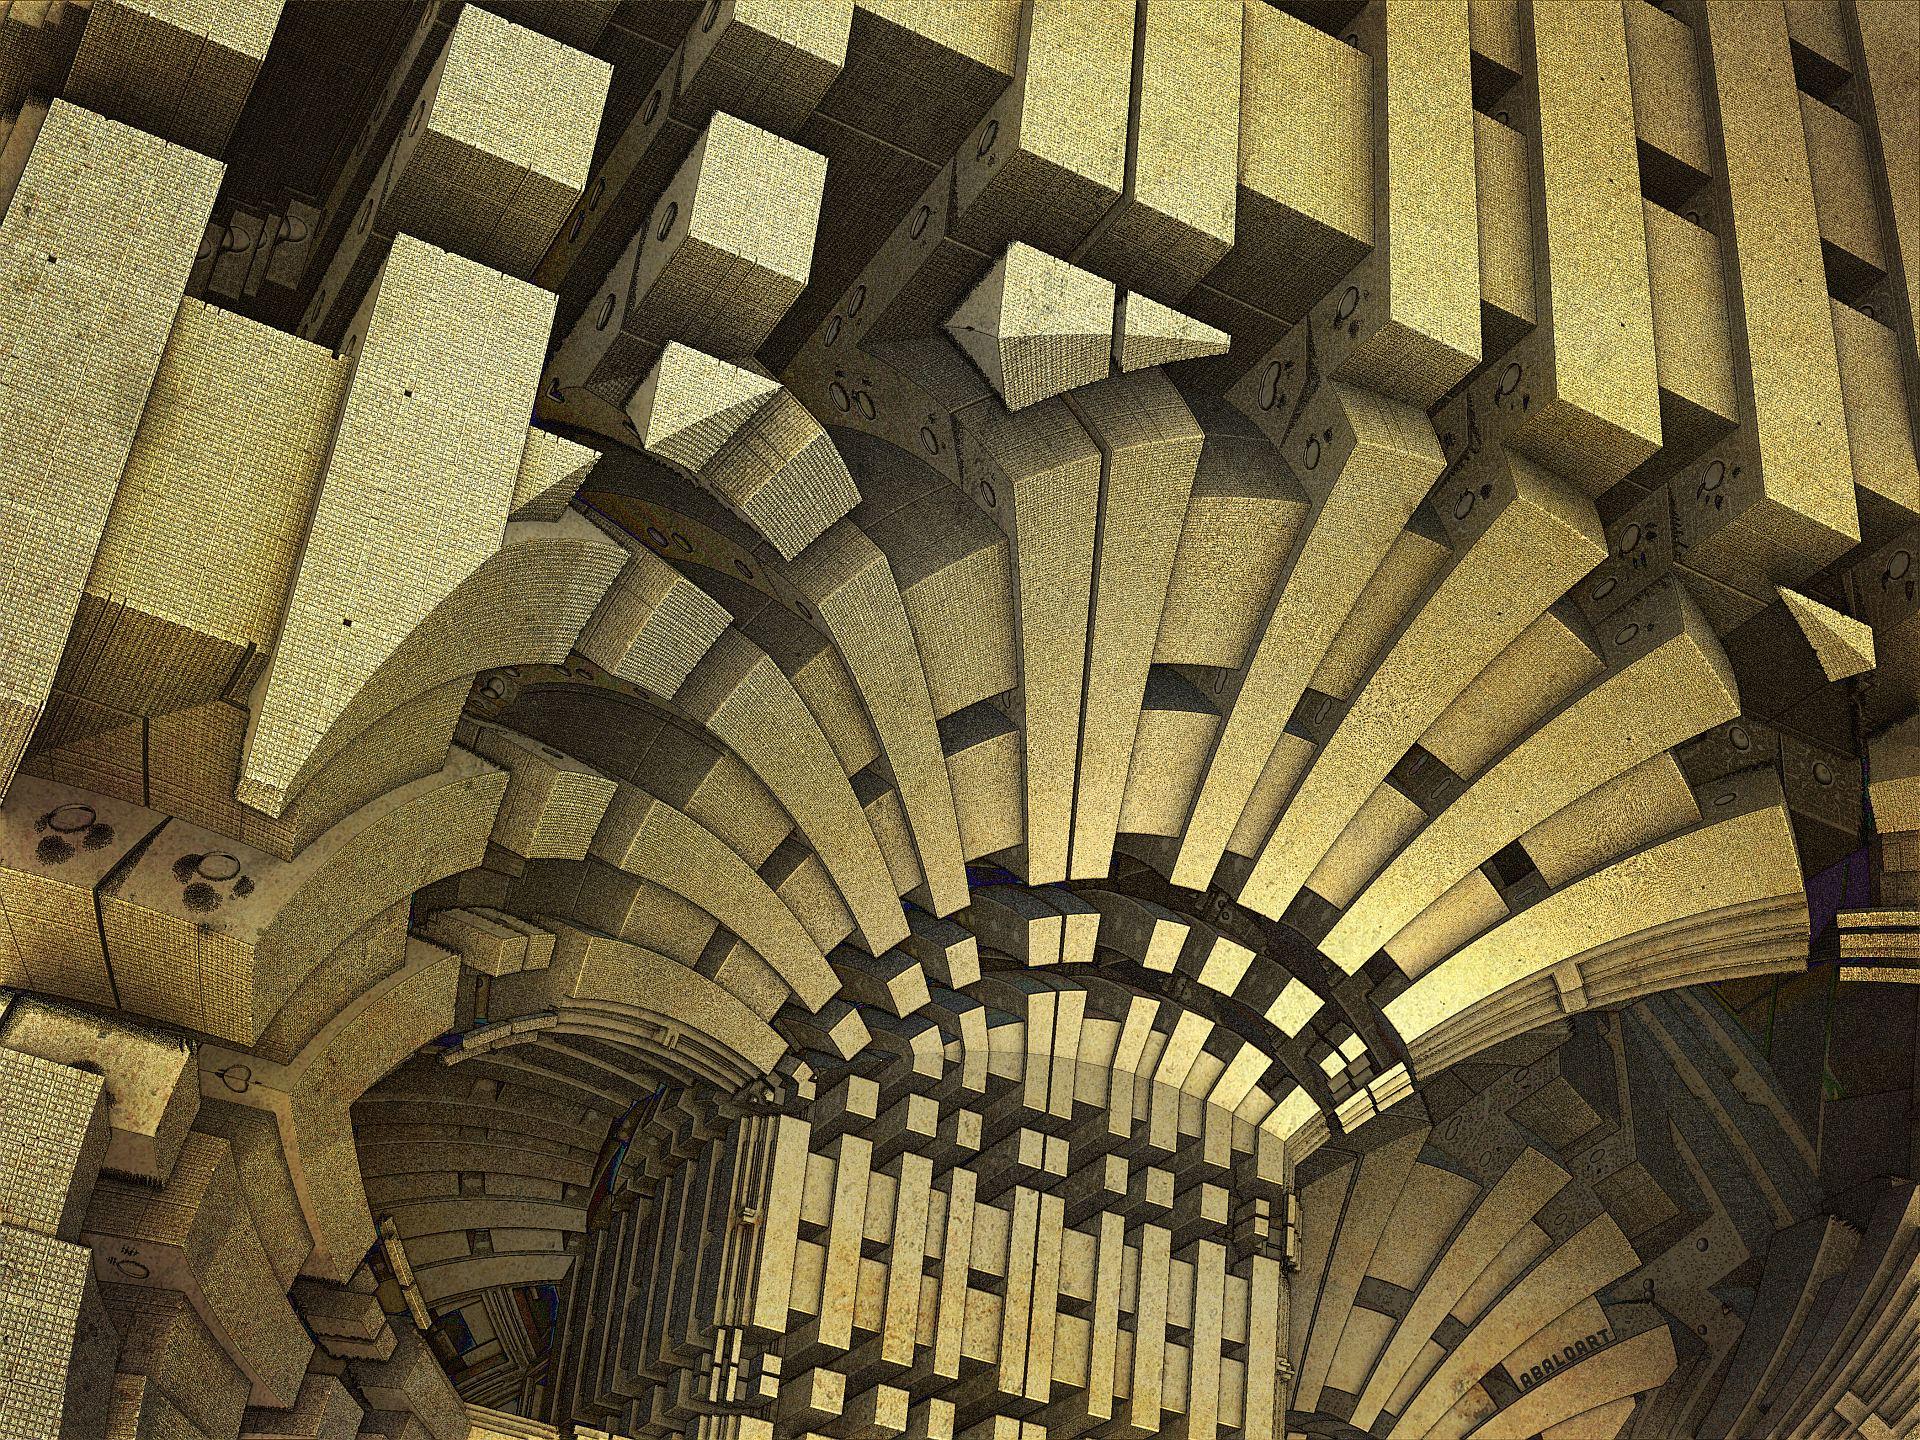 Portico by batjorge